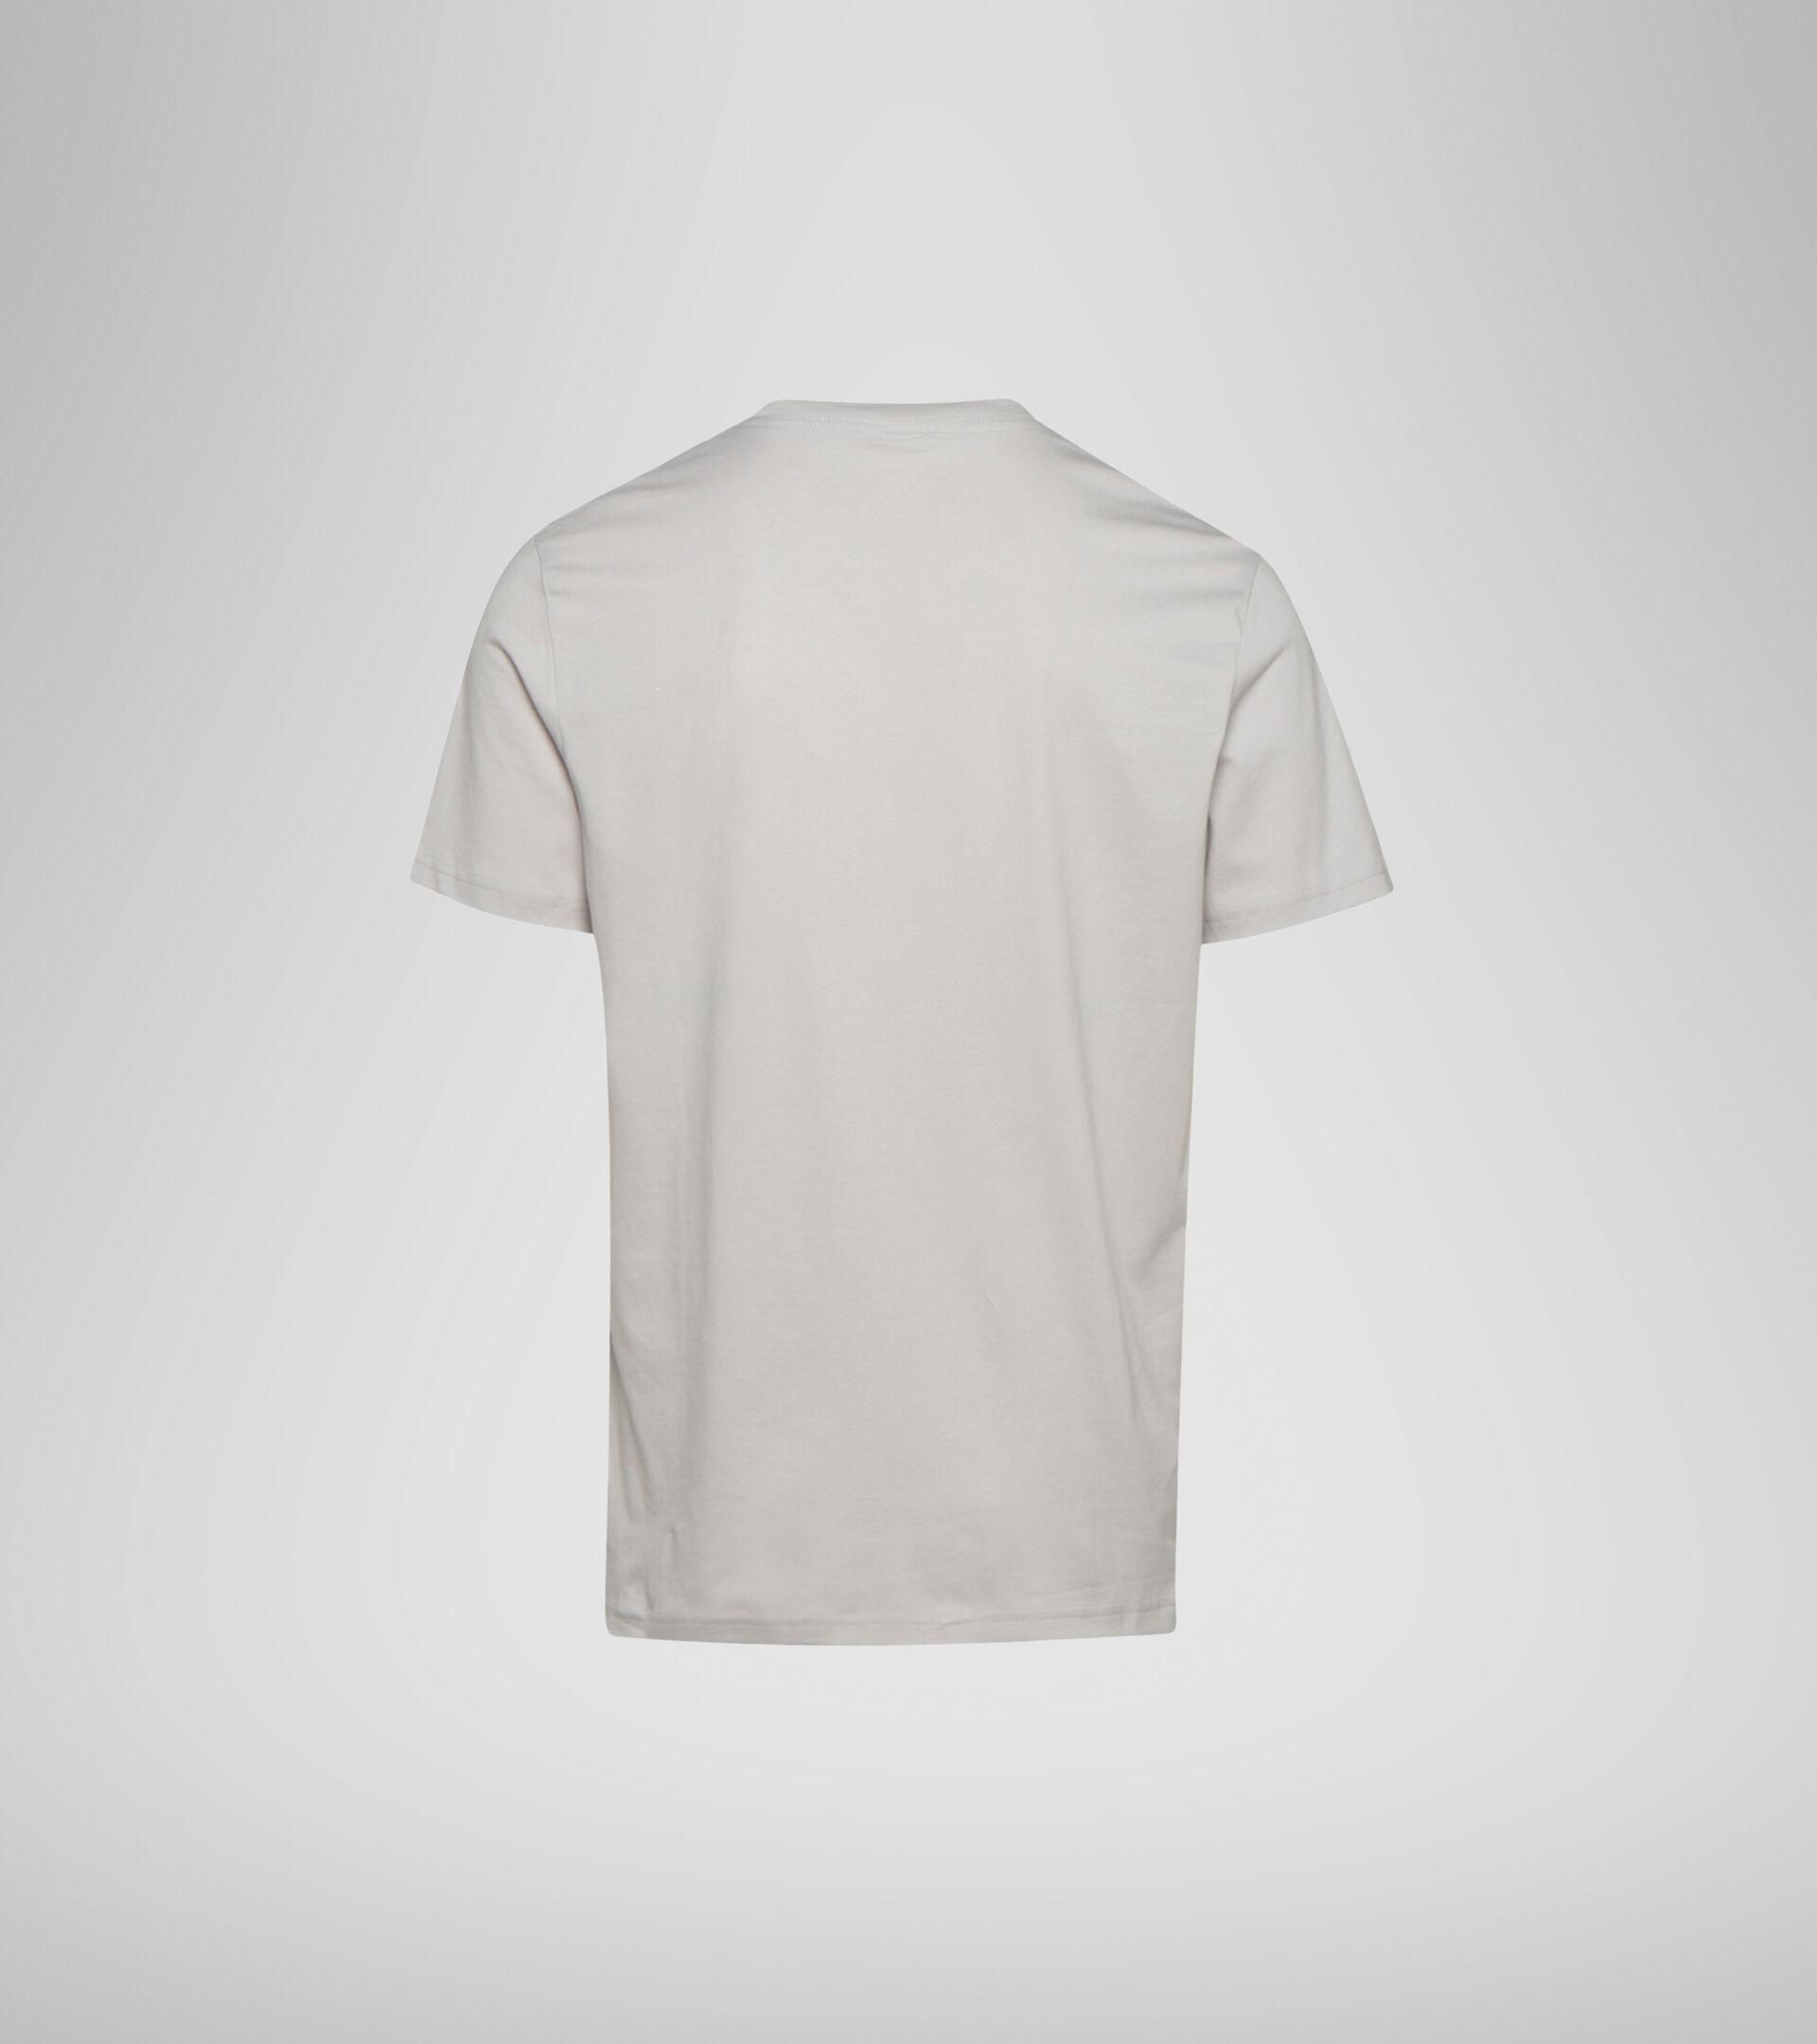 Camiseta - Unisex SS T-SHIRT SPECTRA OC GRIS GIRGOLA - Diadora